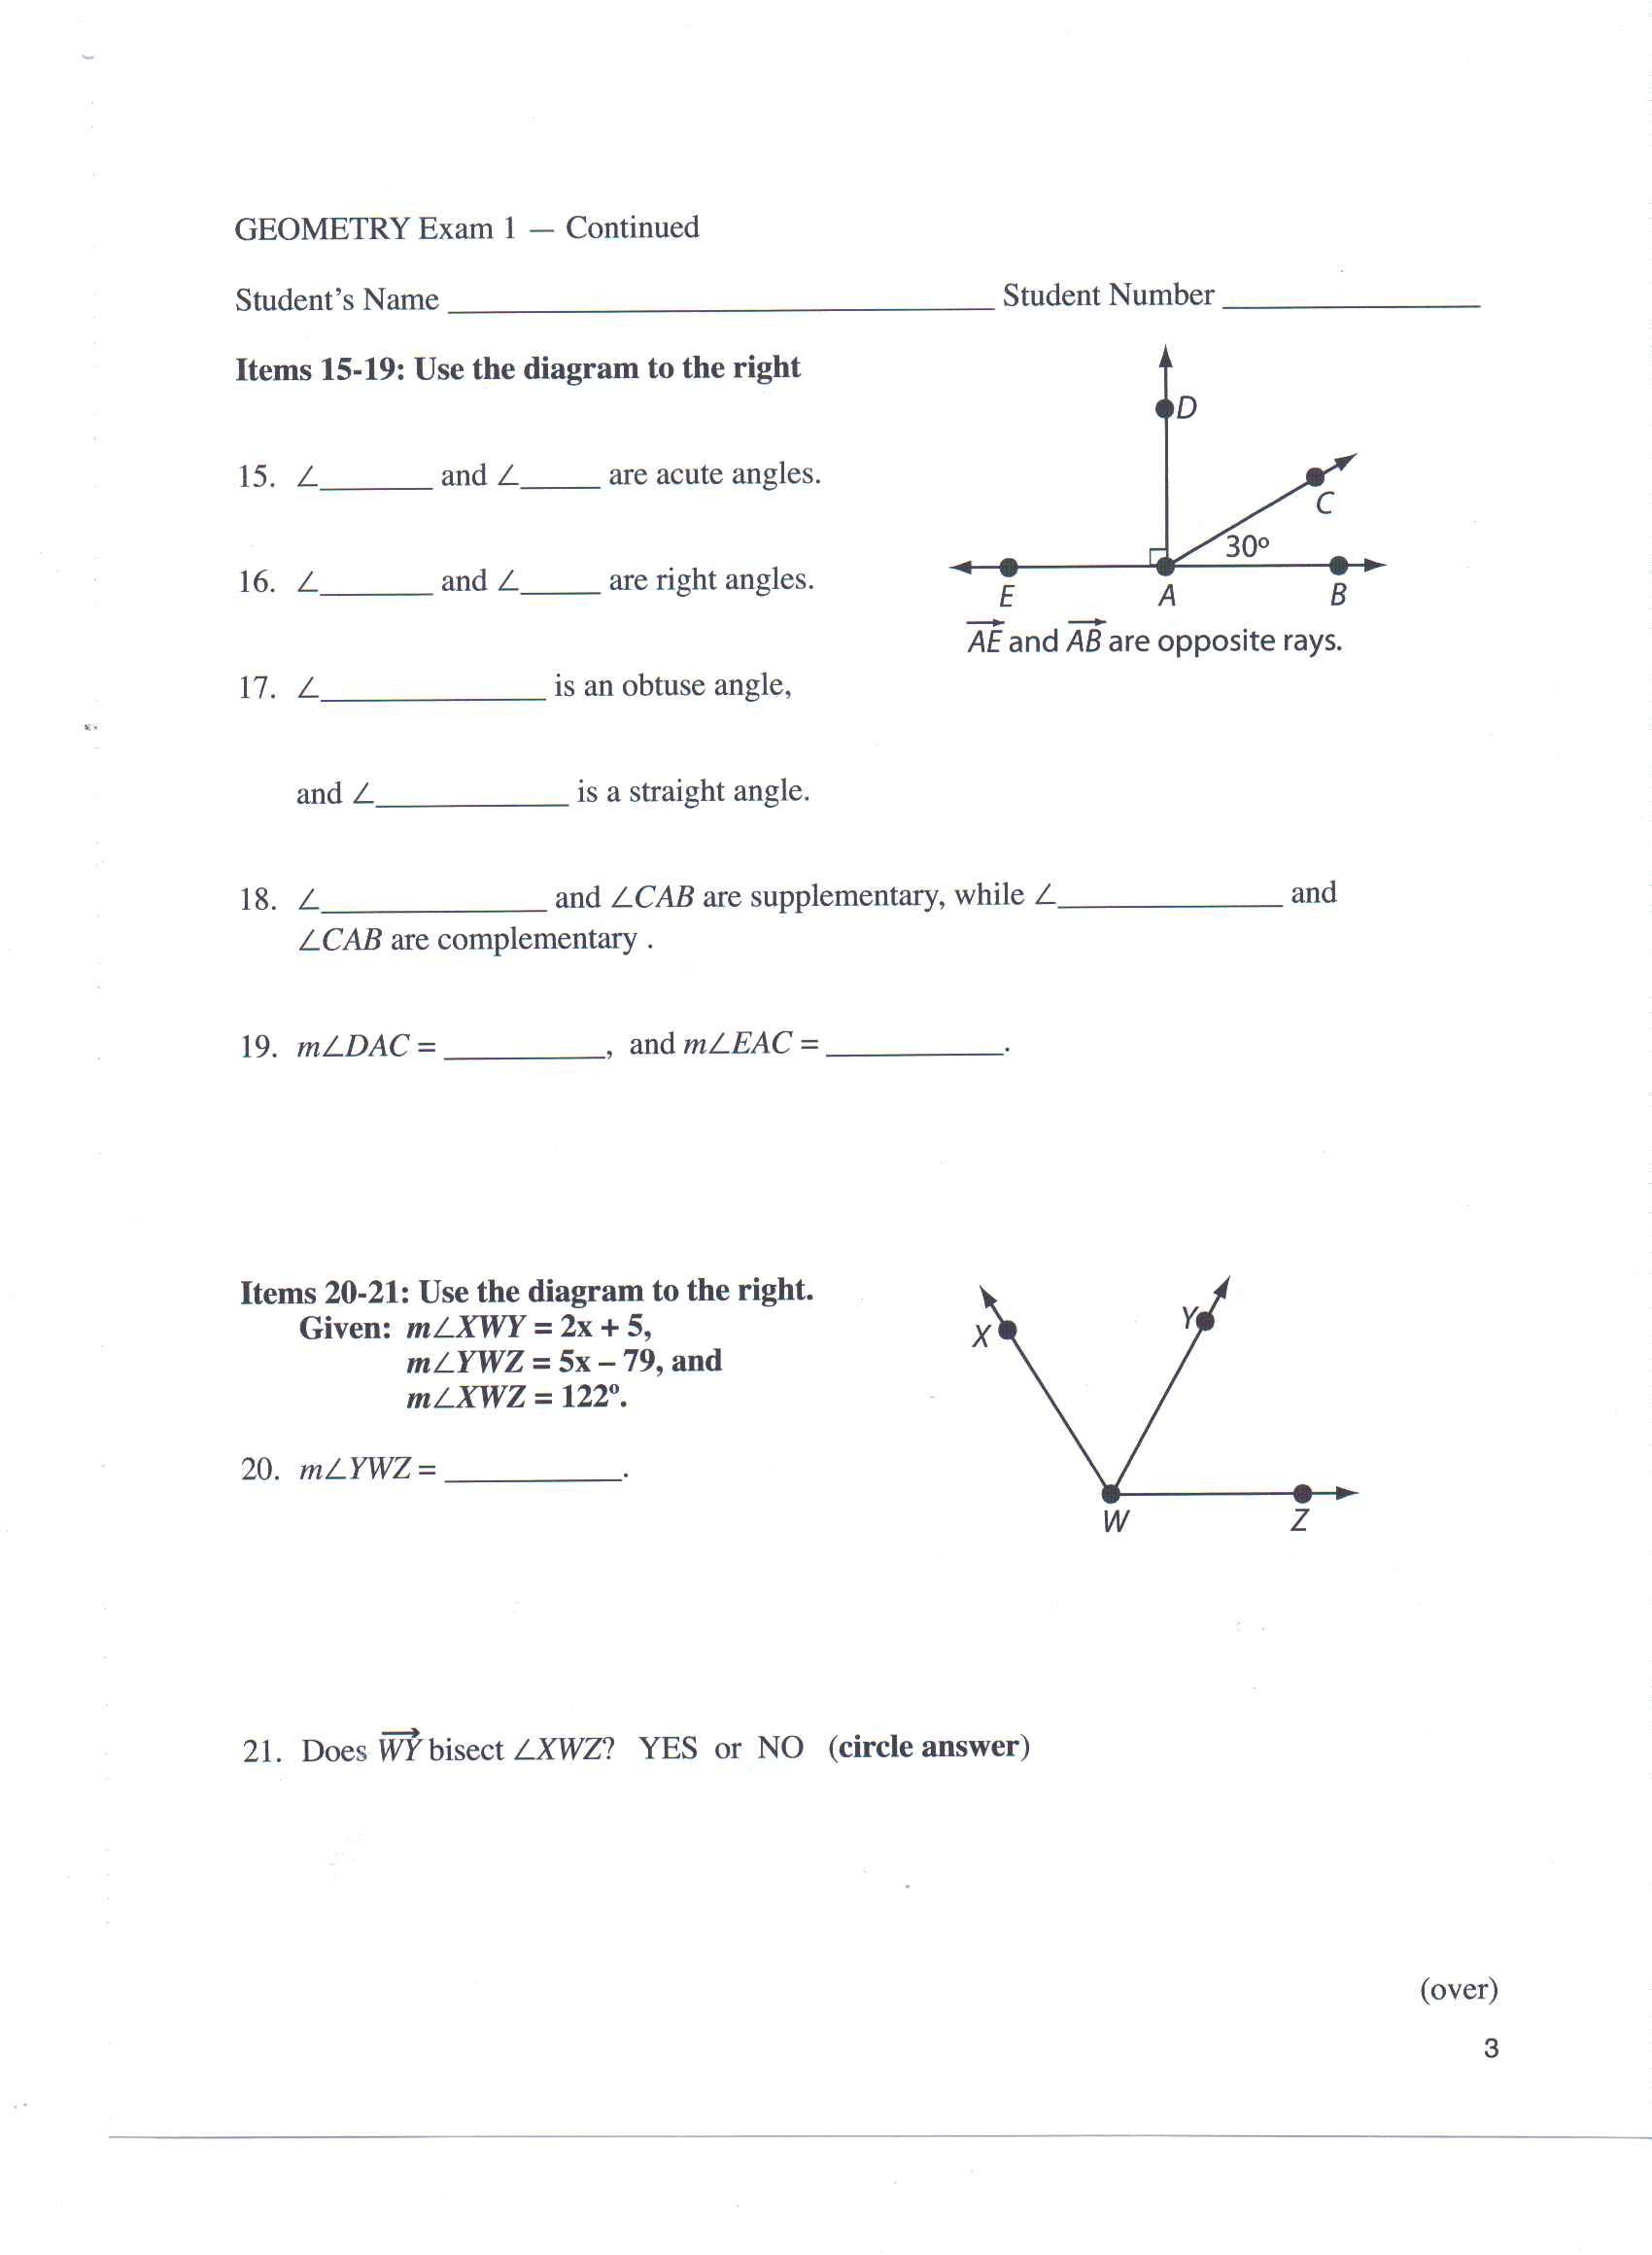 Angle homework help